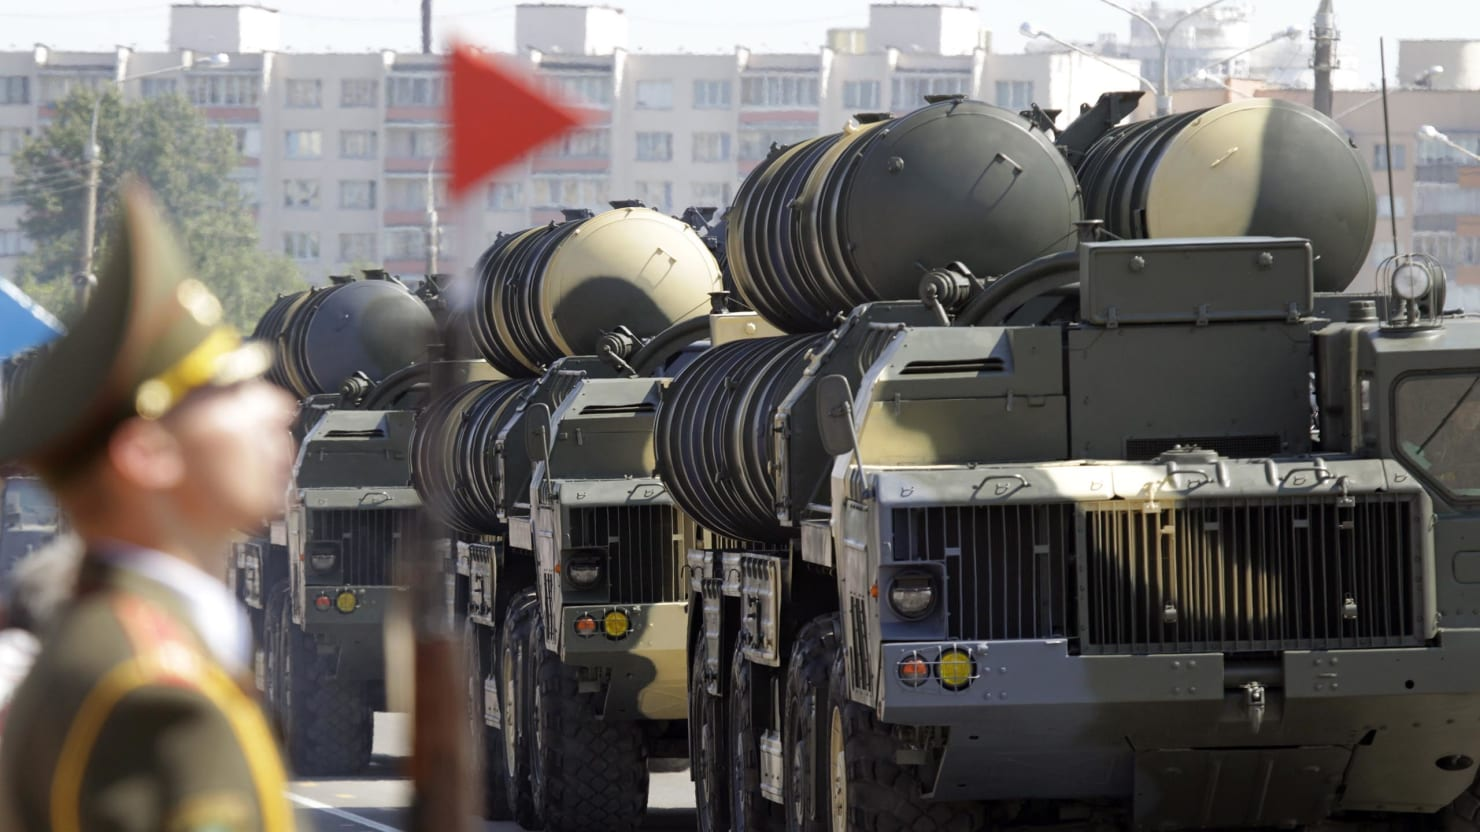 S 300 missile systems vs patriot - Vasily Fedosenko Reuters